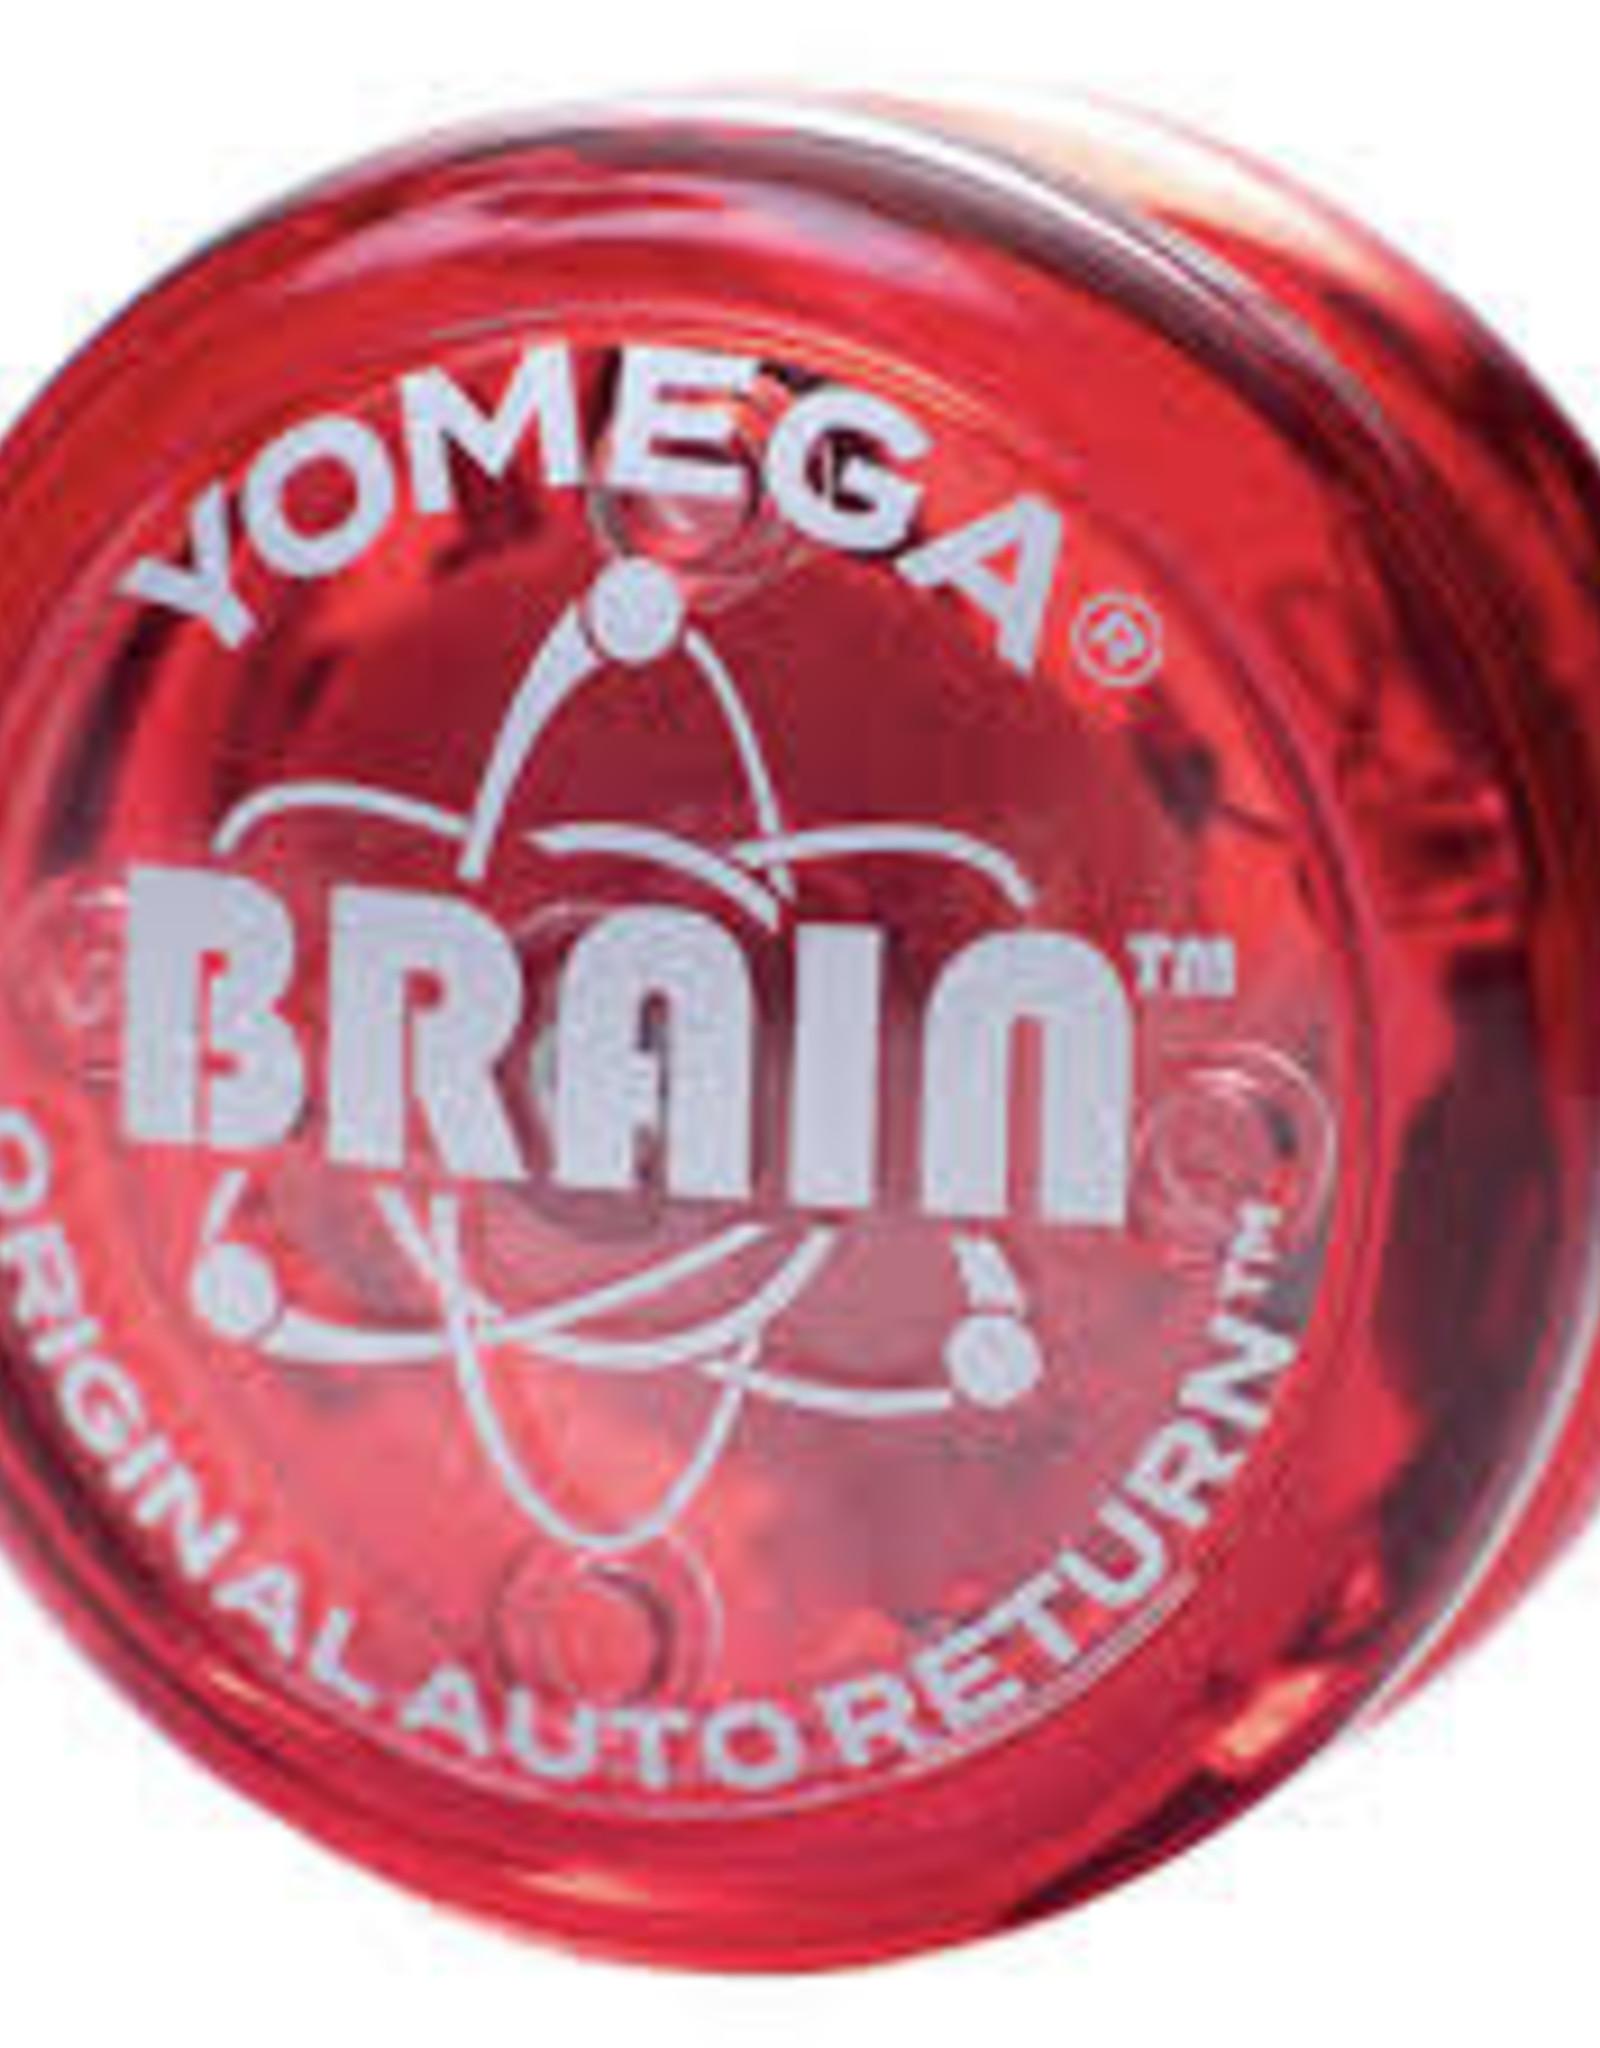 Yomega Yomega Brain